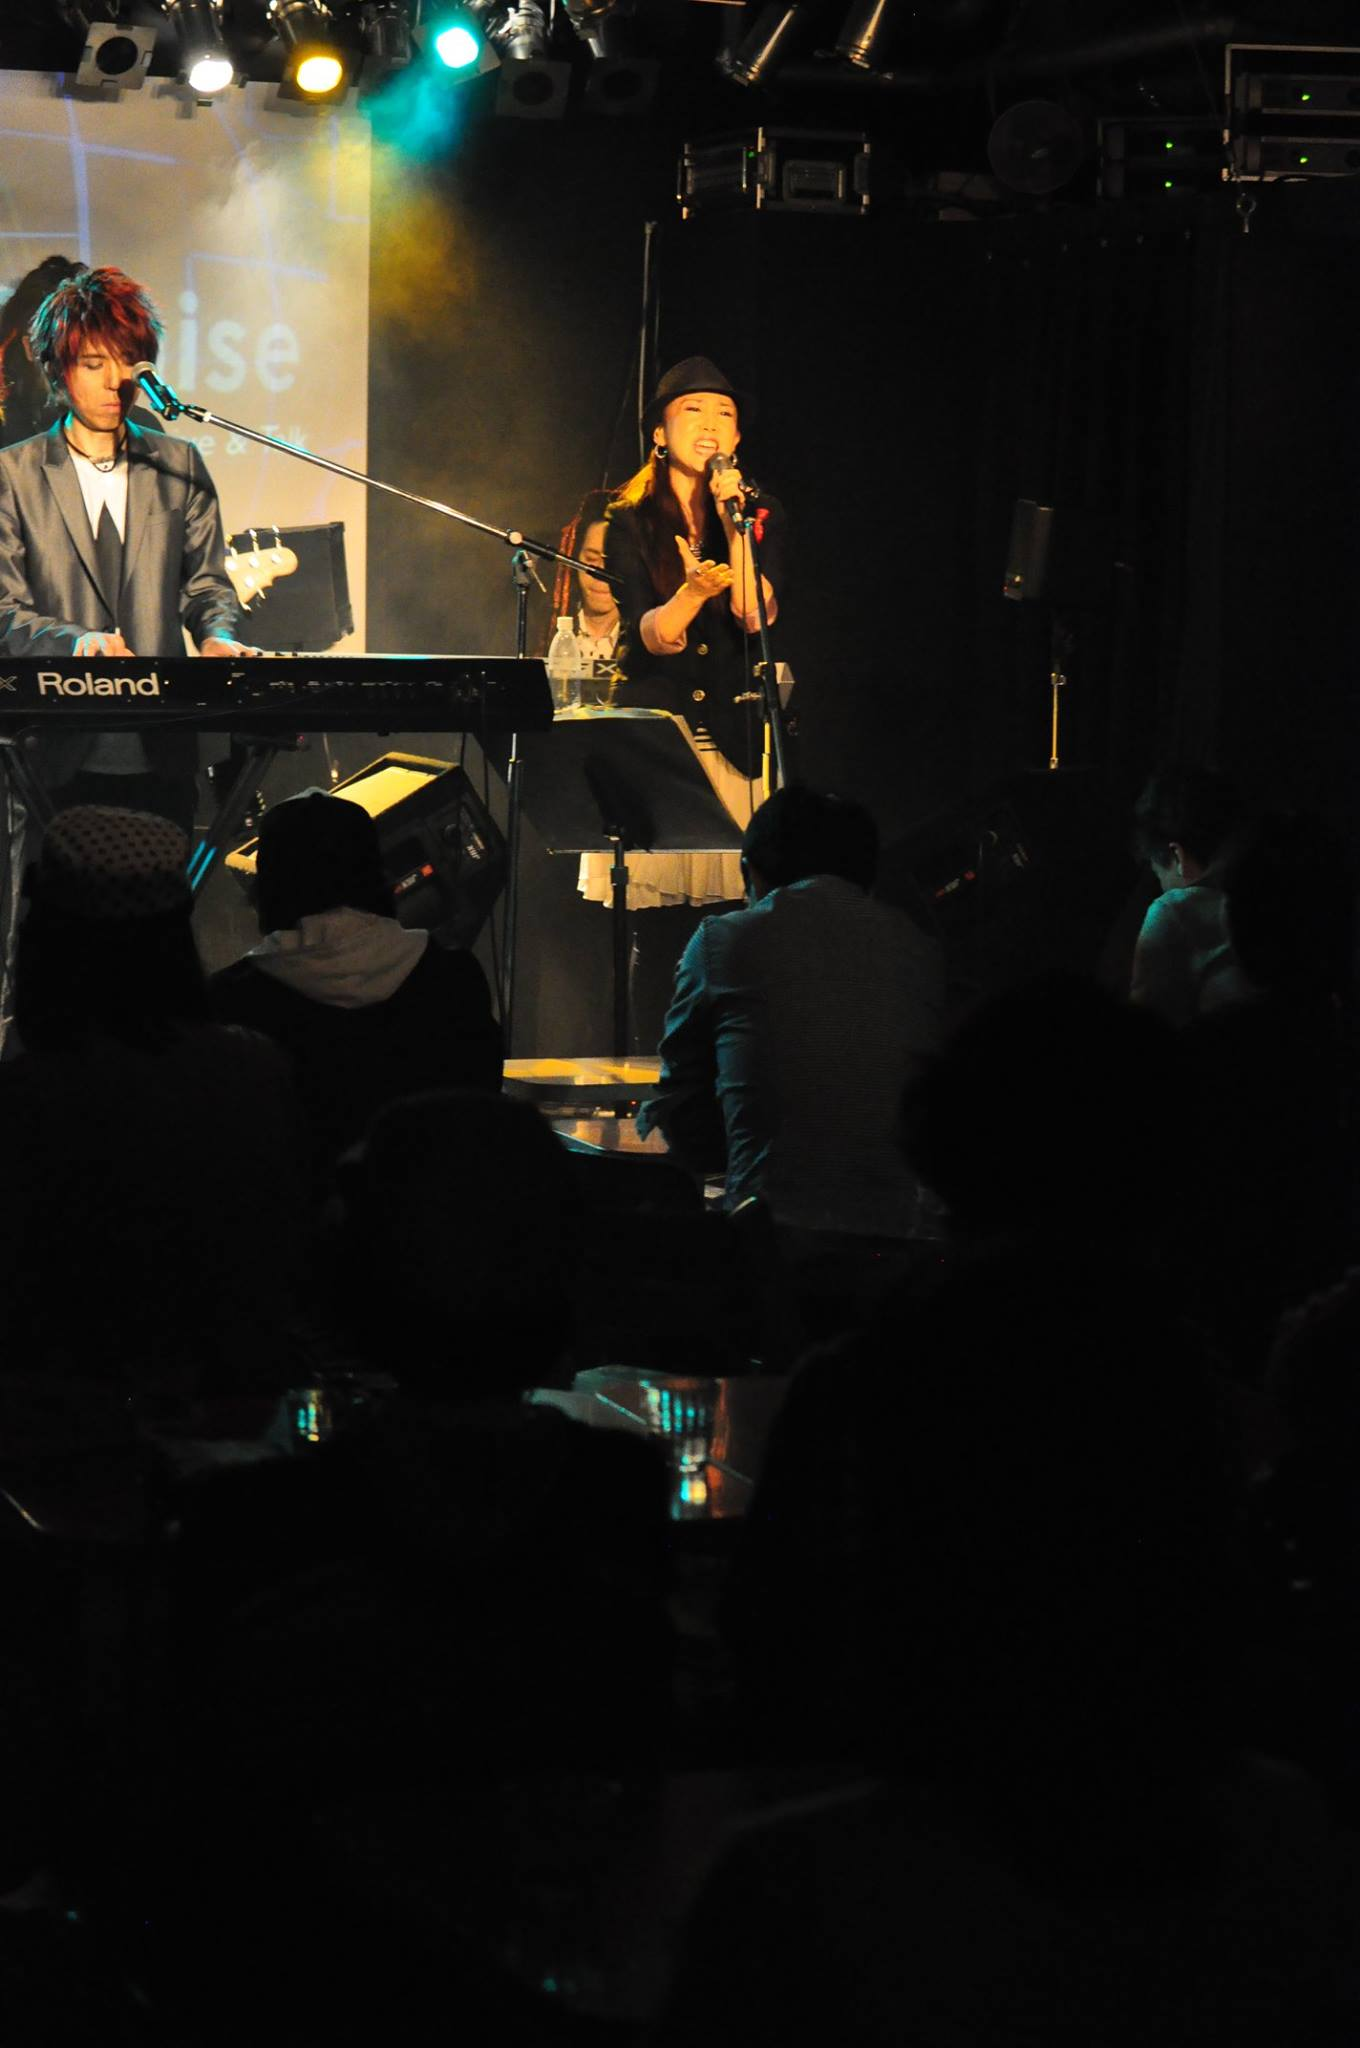 http://www.kickbackcafe.jp/support2/report/13122980_1035403609840513_4733359286135029631_o.jpg